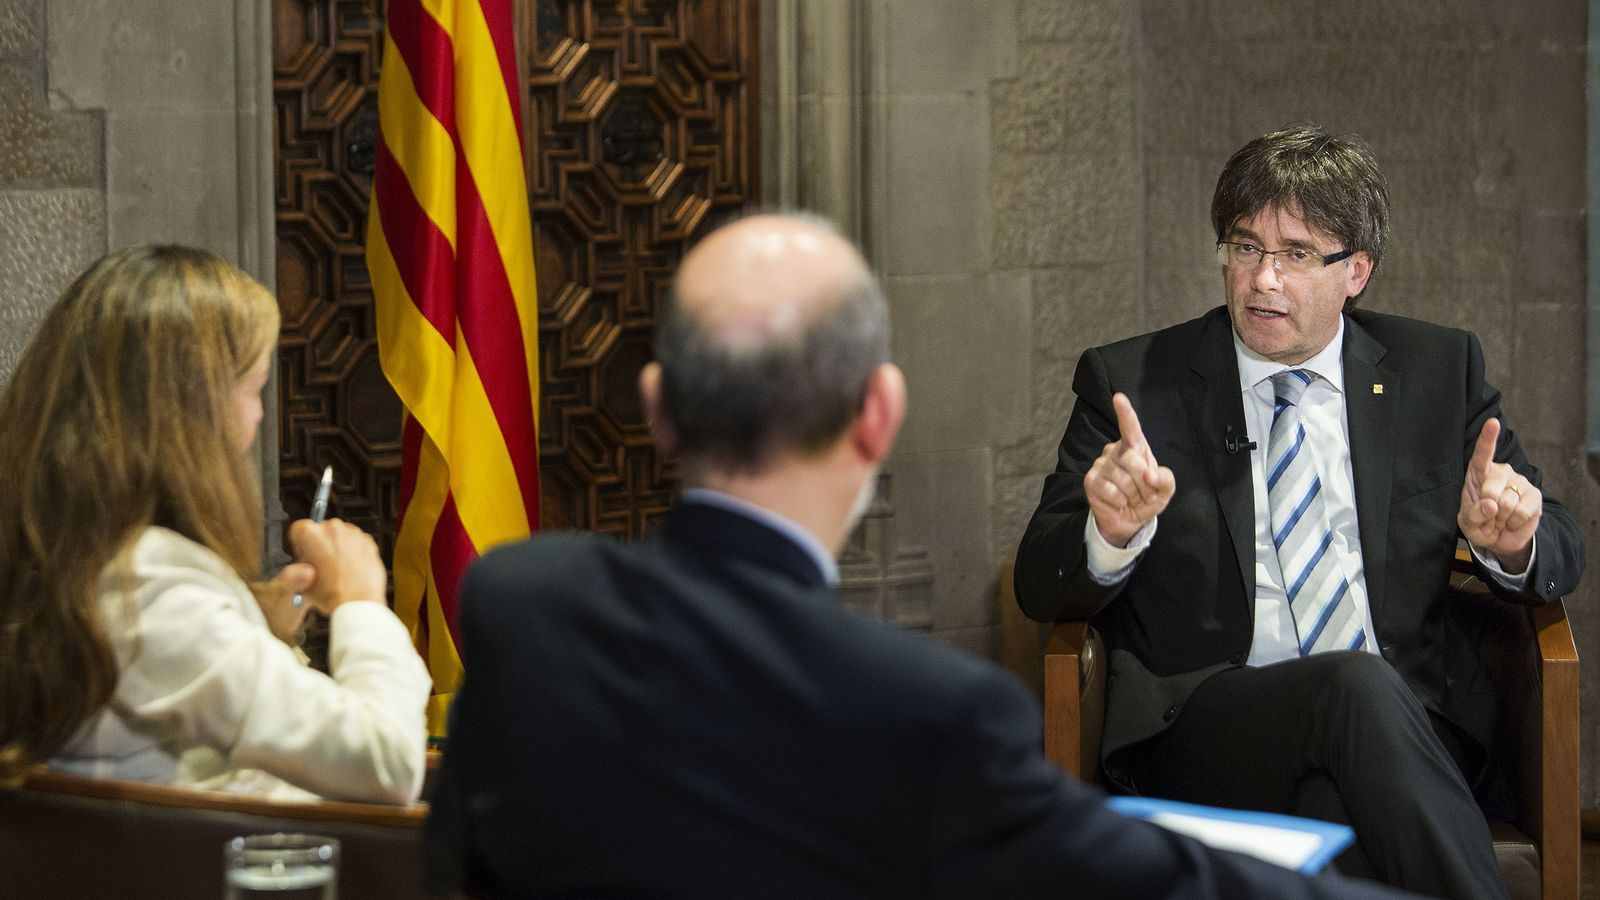 Entrevista d'Esther Vera i Antoni Bassas a Carles Puigdemont